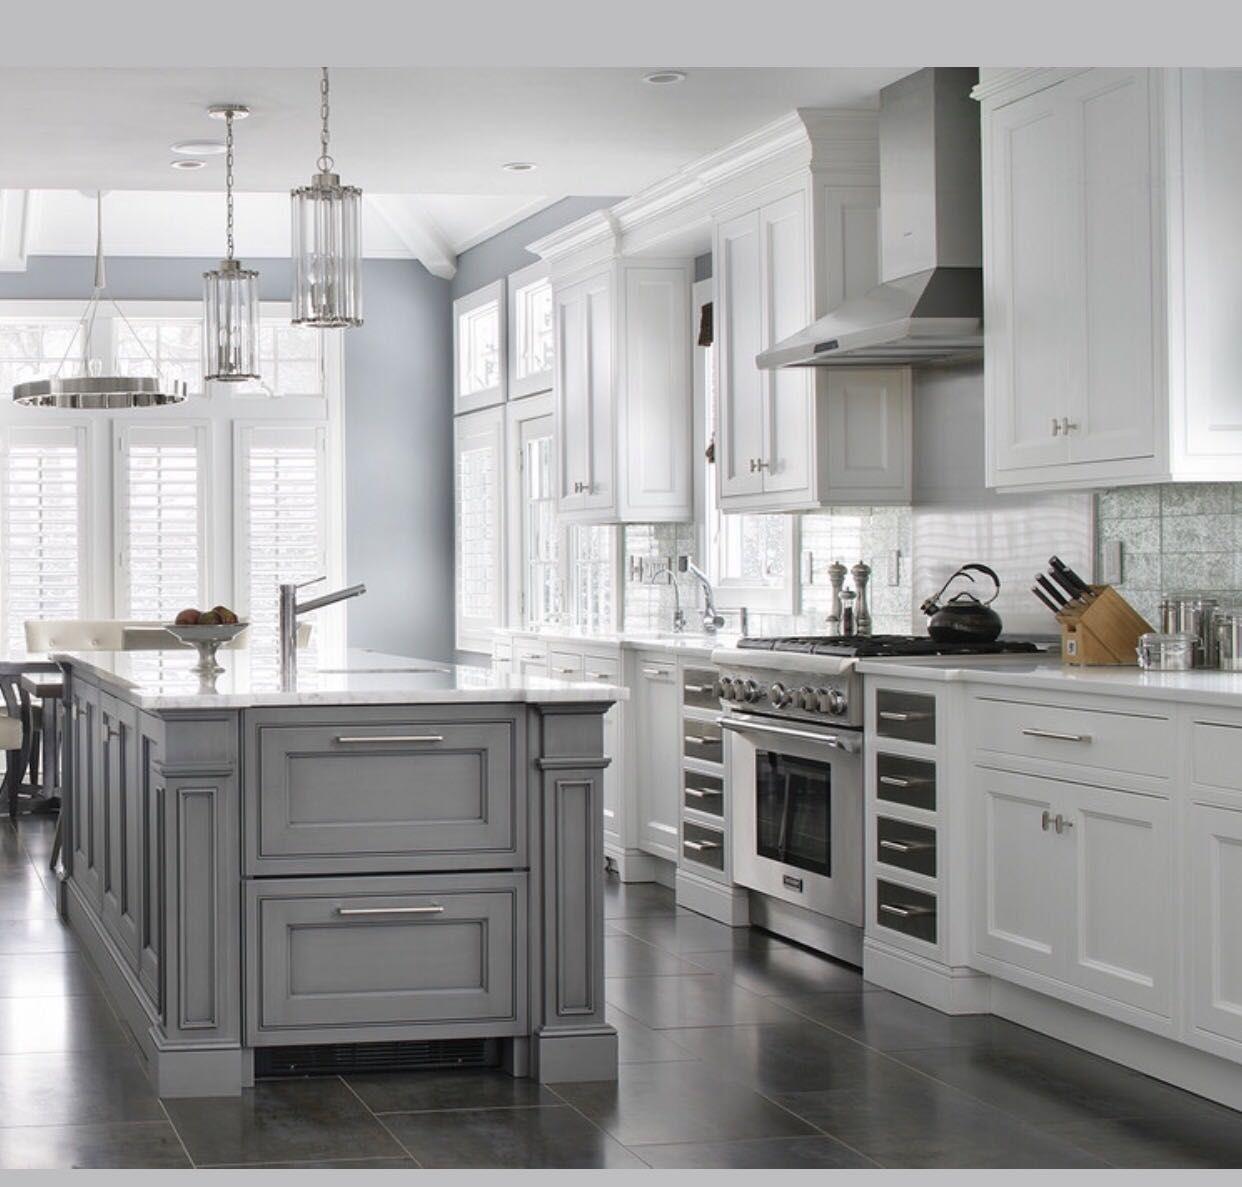 image by on kitchen ideas white kitchen design grey kitchen designs gray and white kitchen on kitchen decor grey cabinets id=31860